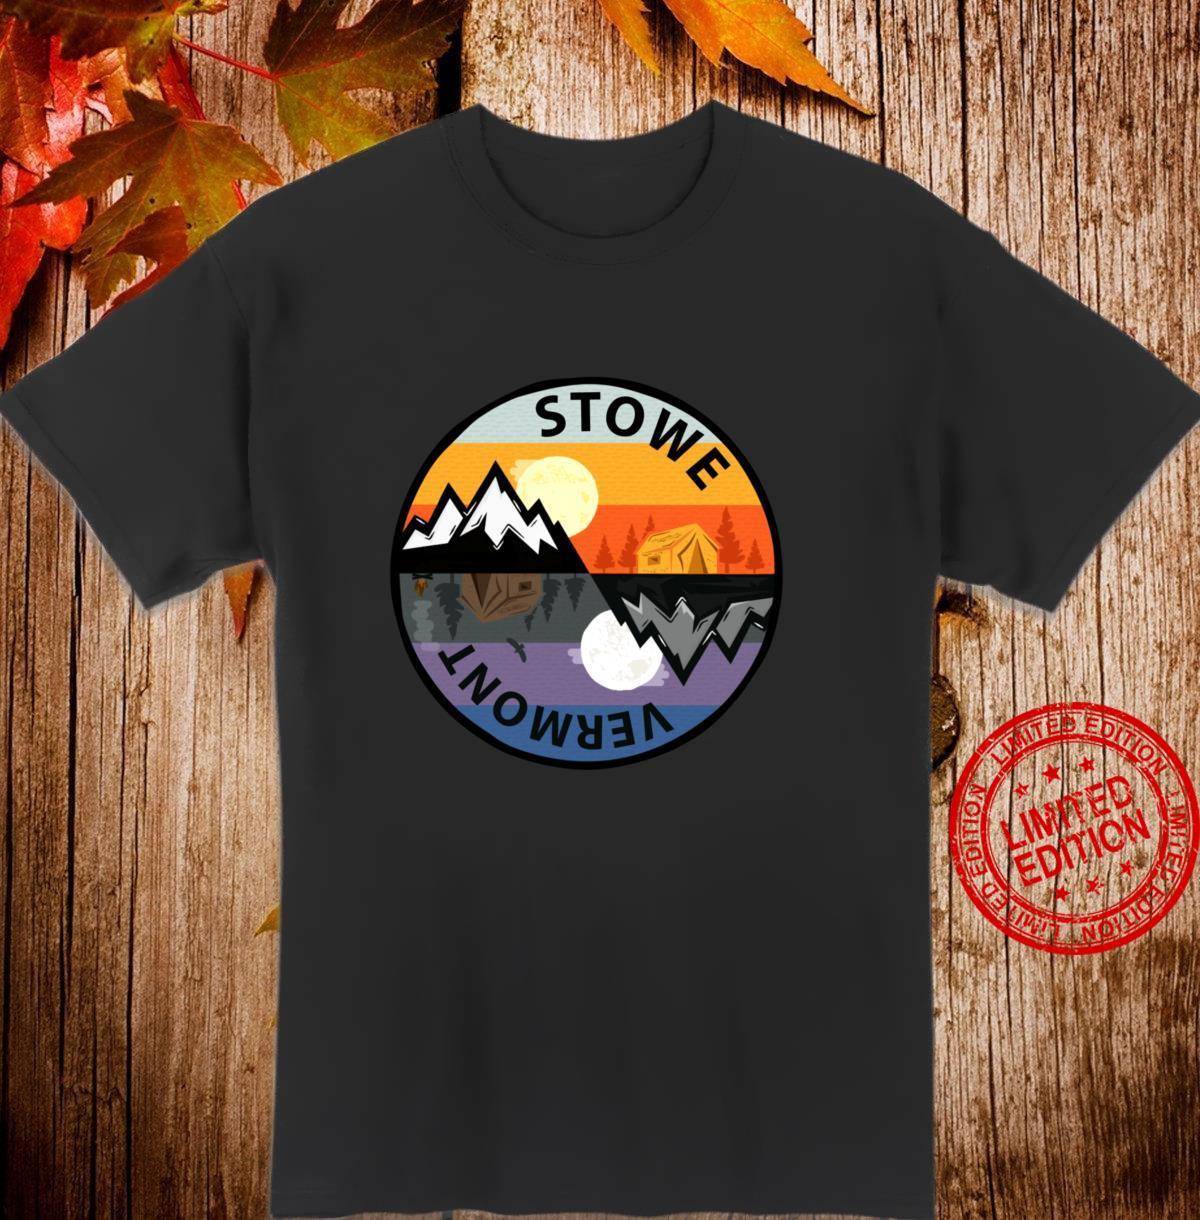 Retro Vintage Stowe, Vermont Souvenir Camping Shirt